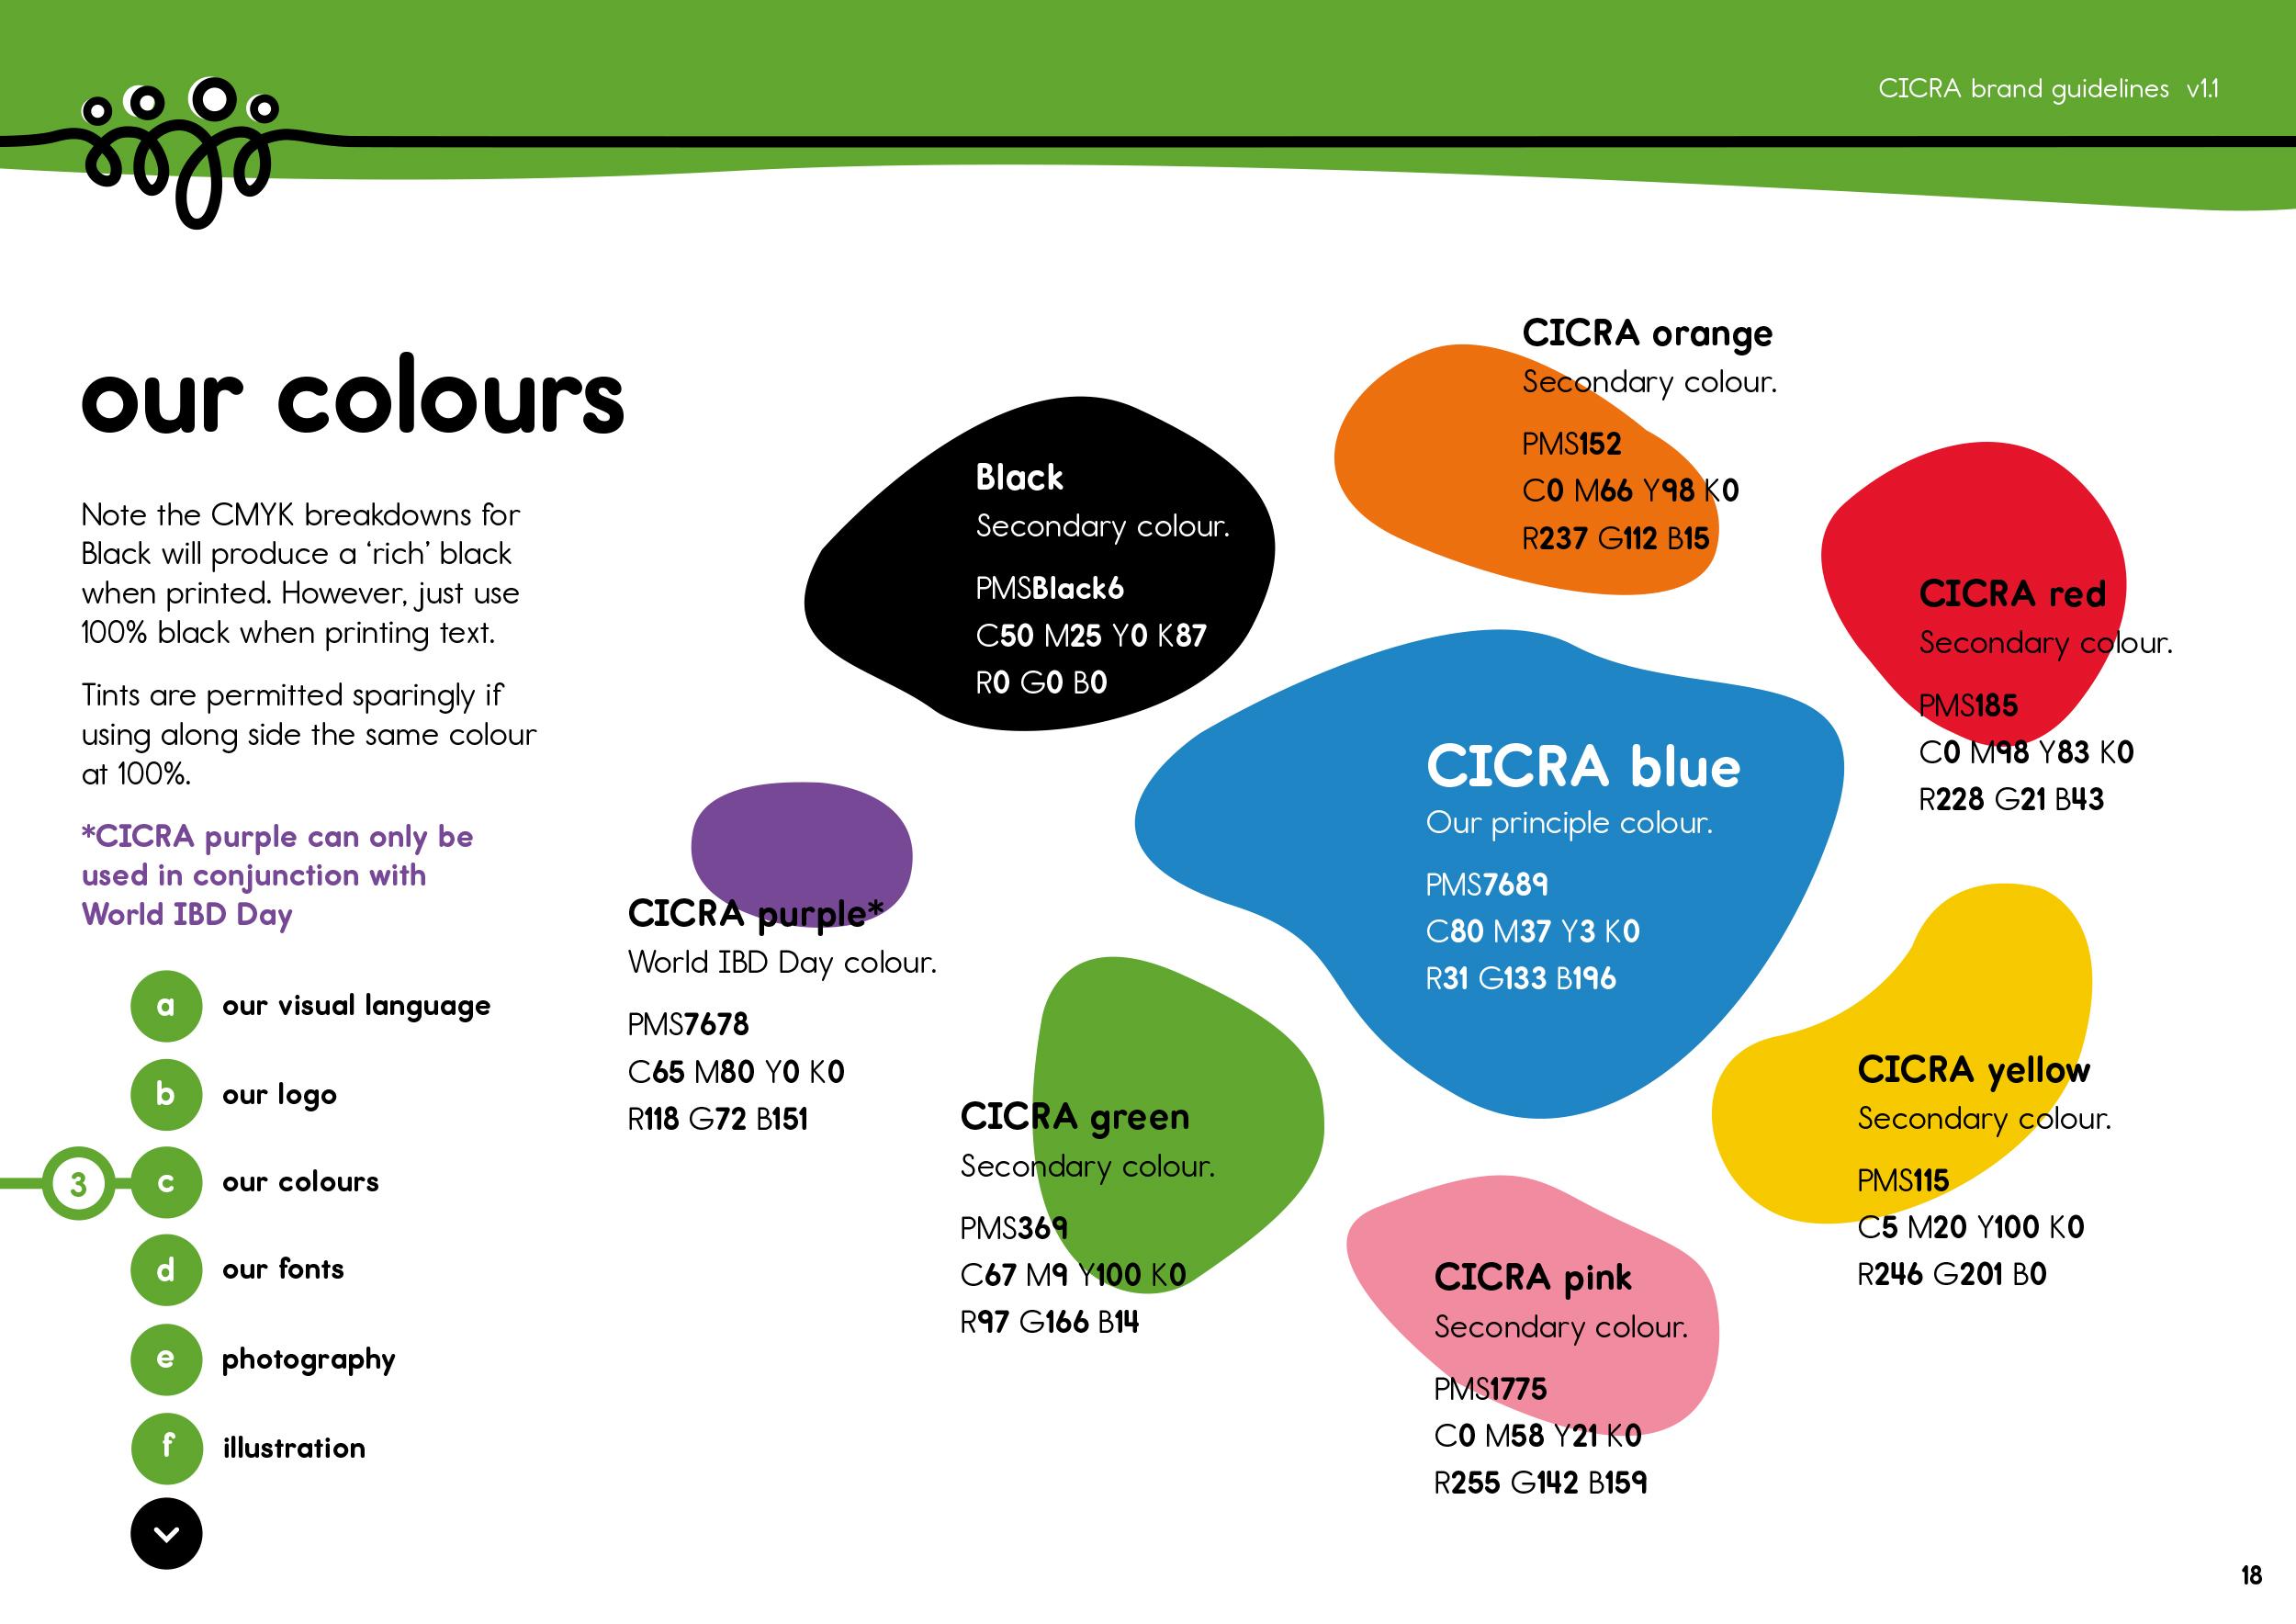 0188 CICRA Brand Guidelines_V1.1-18.jpg